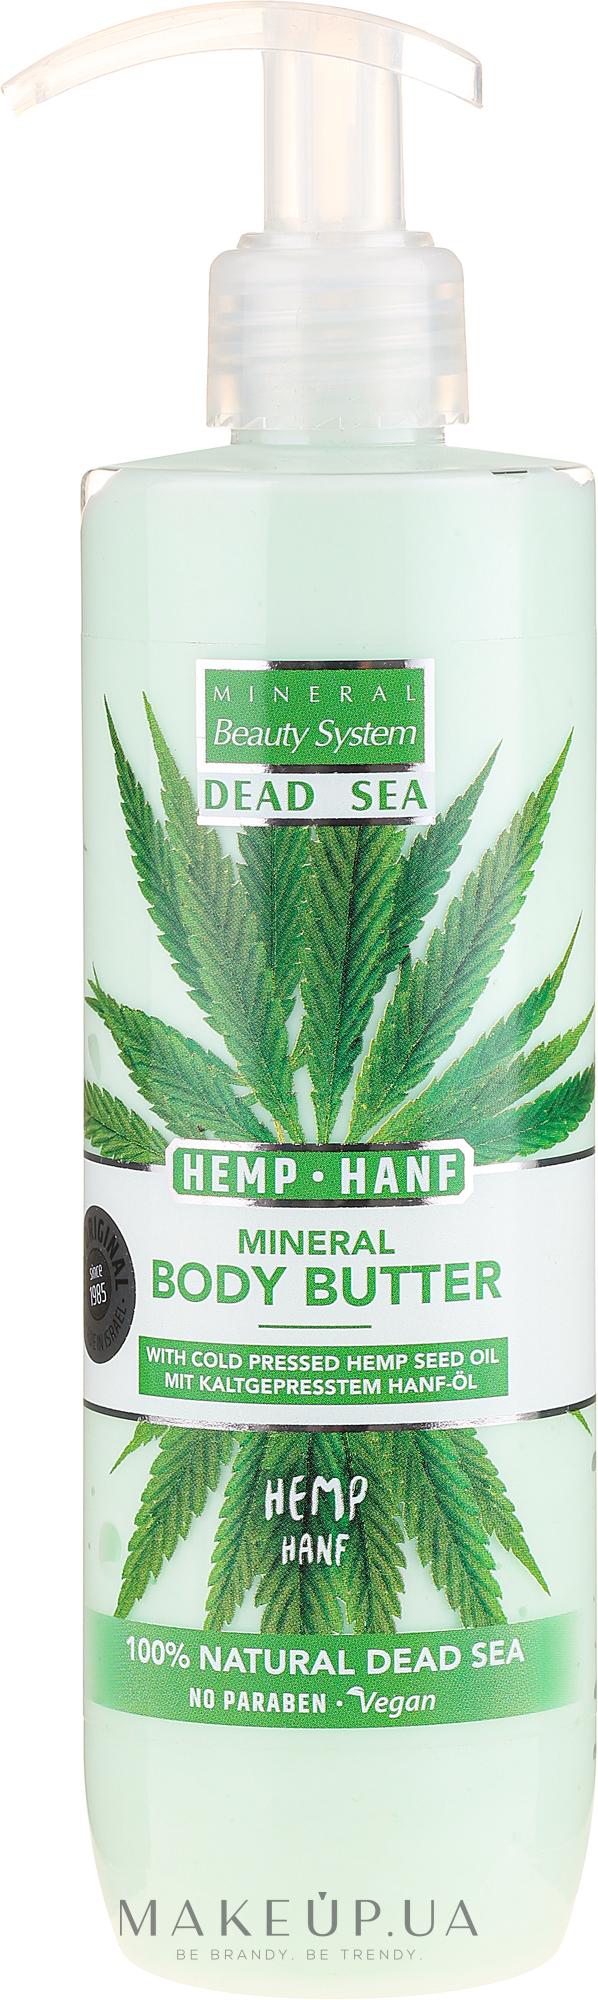 Конопляное масло для тела с минералами Мёртвого моря - Mineral Beauty System Dead Sea Minerals & Cold Pressed Hemp Oil Body Butter — фото 300ml